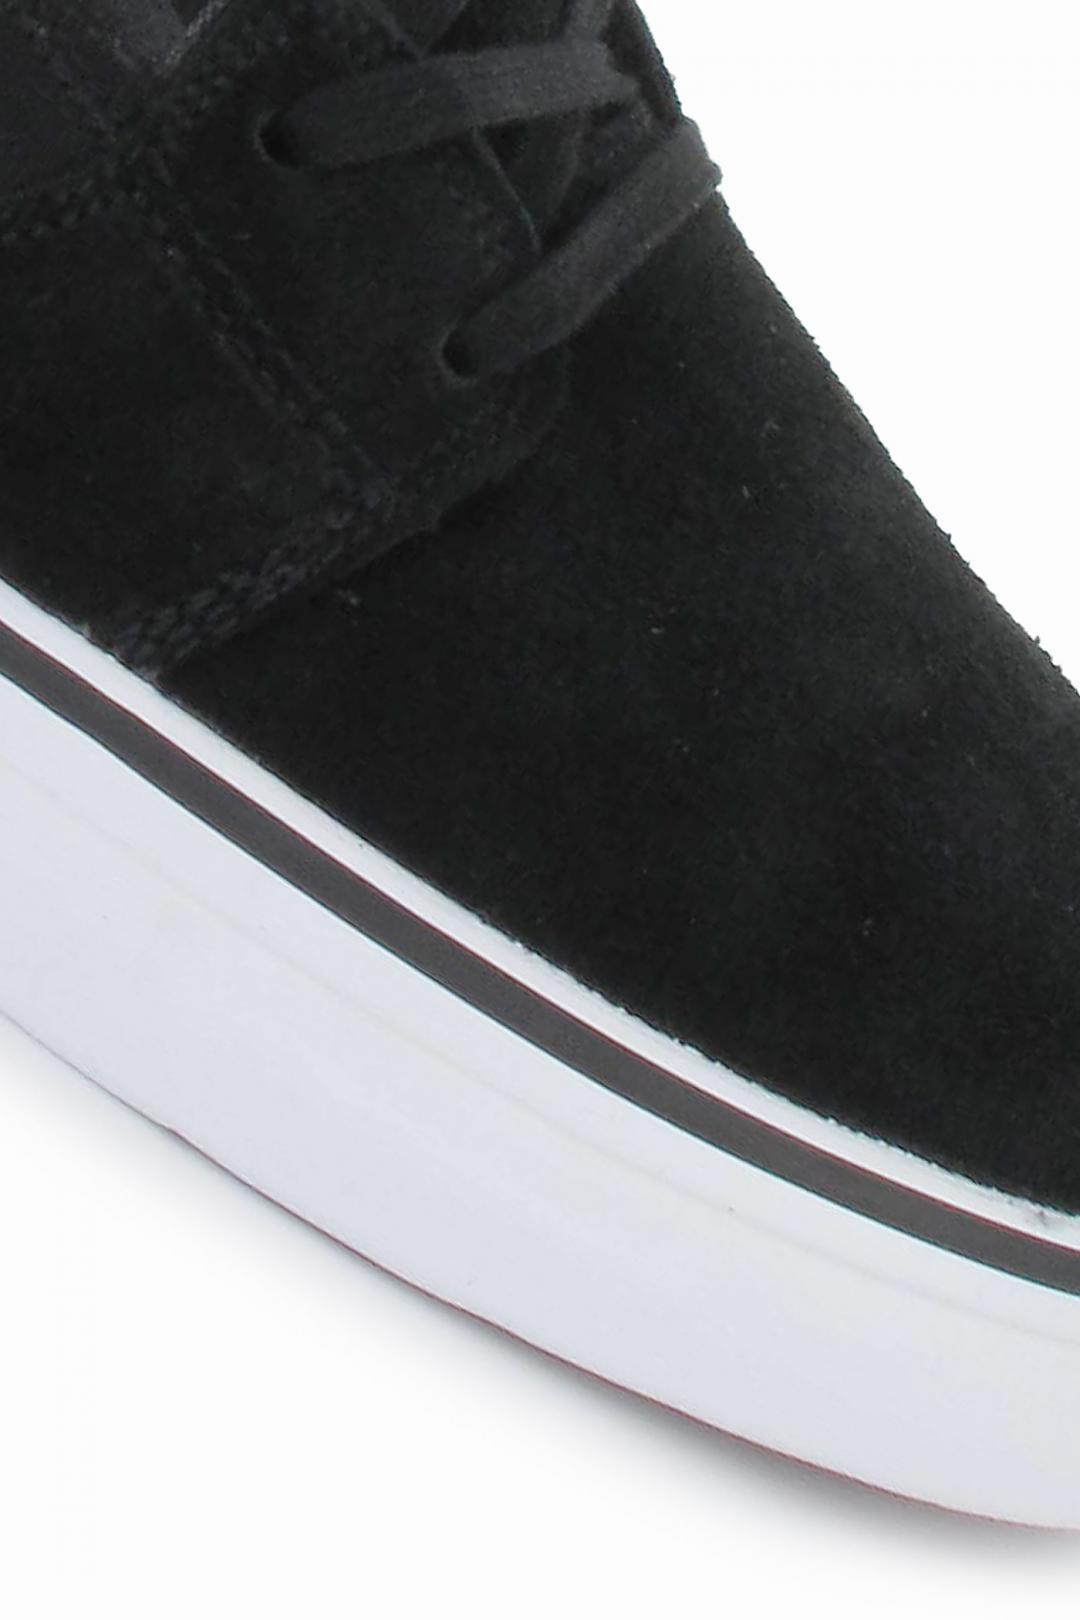 Uomo Lakai Judo Suede black | Sneakers low top